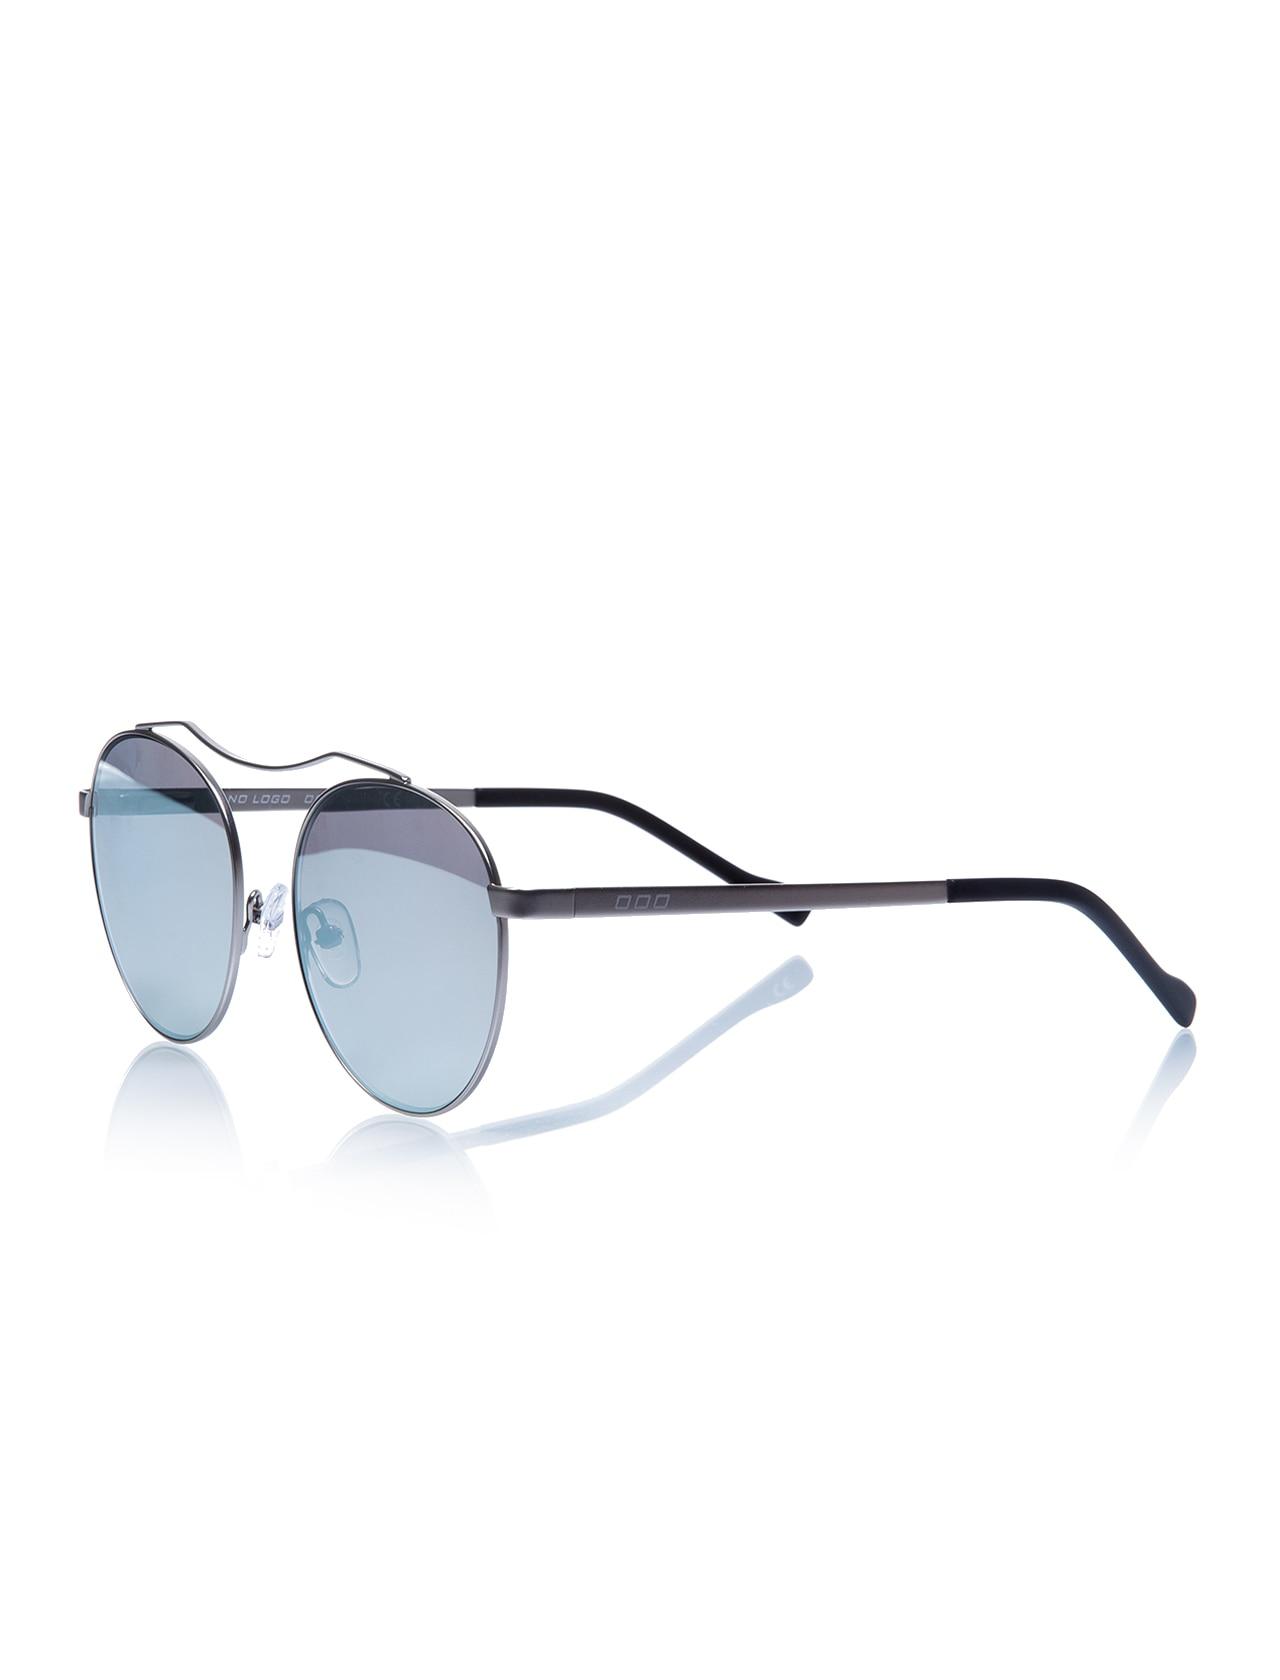 Gafas de sol Unisex nl 9869 e310 2et metal plateado orgánico redondo 51-19-135 sin logotipo